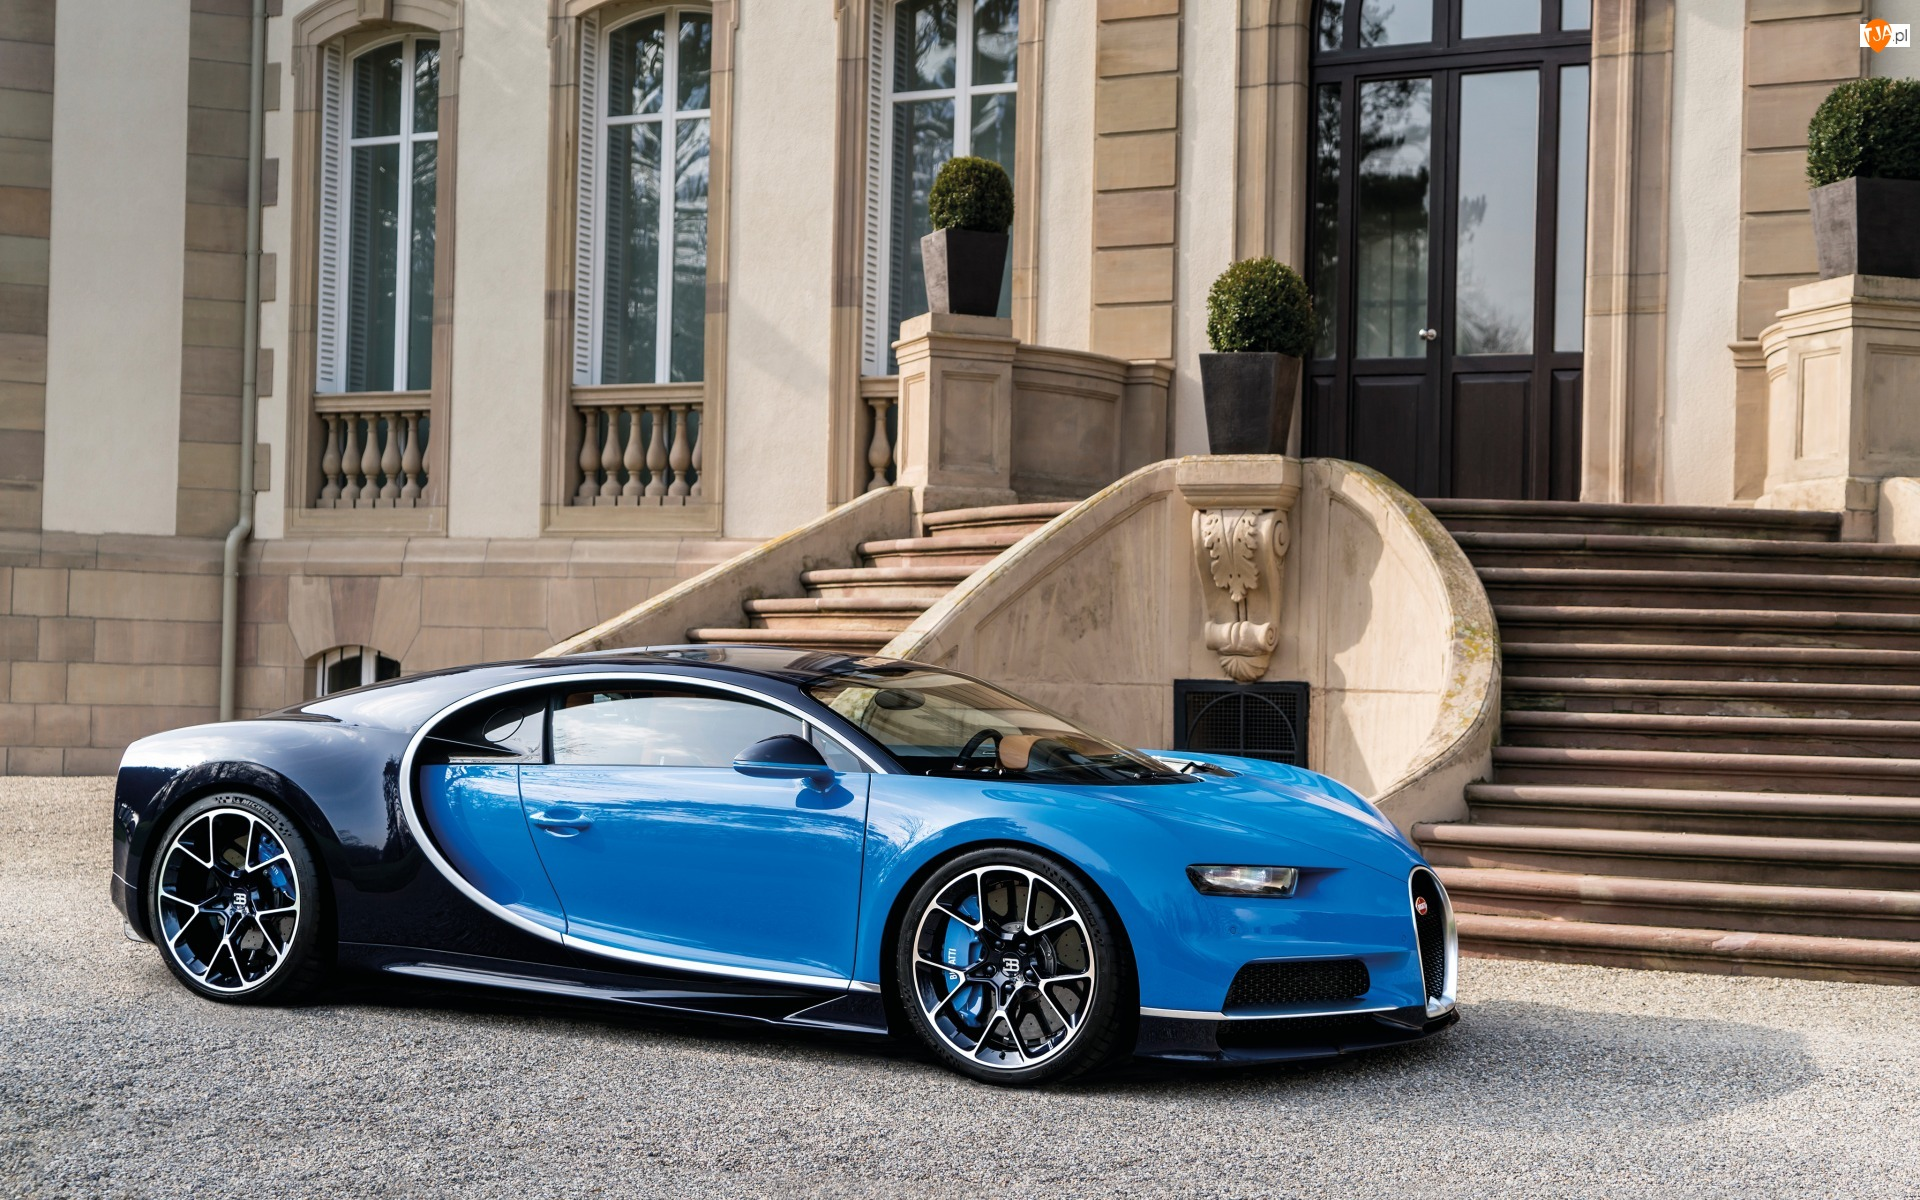 2016, Niebieski, Bugatti Chiron